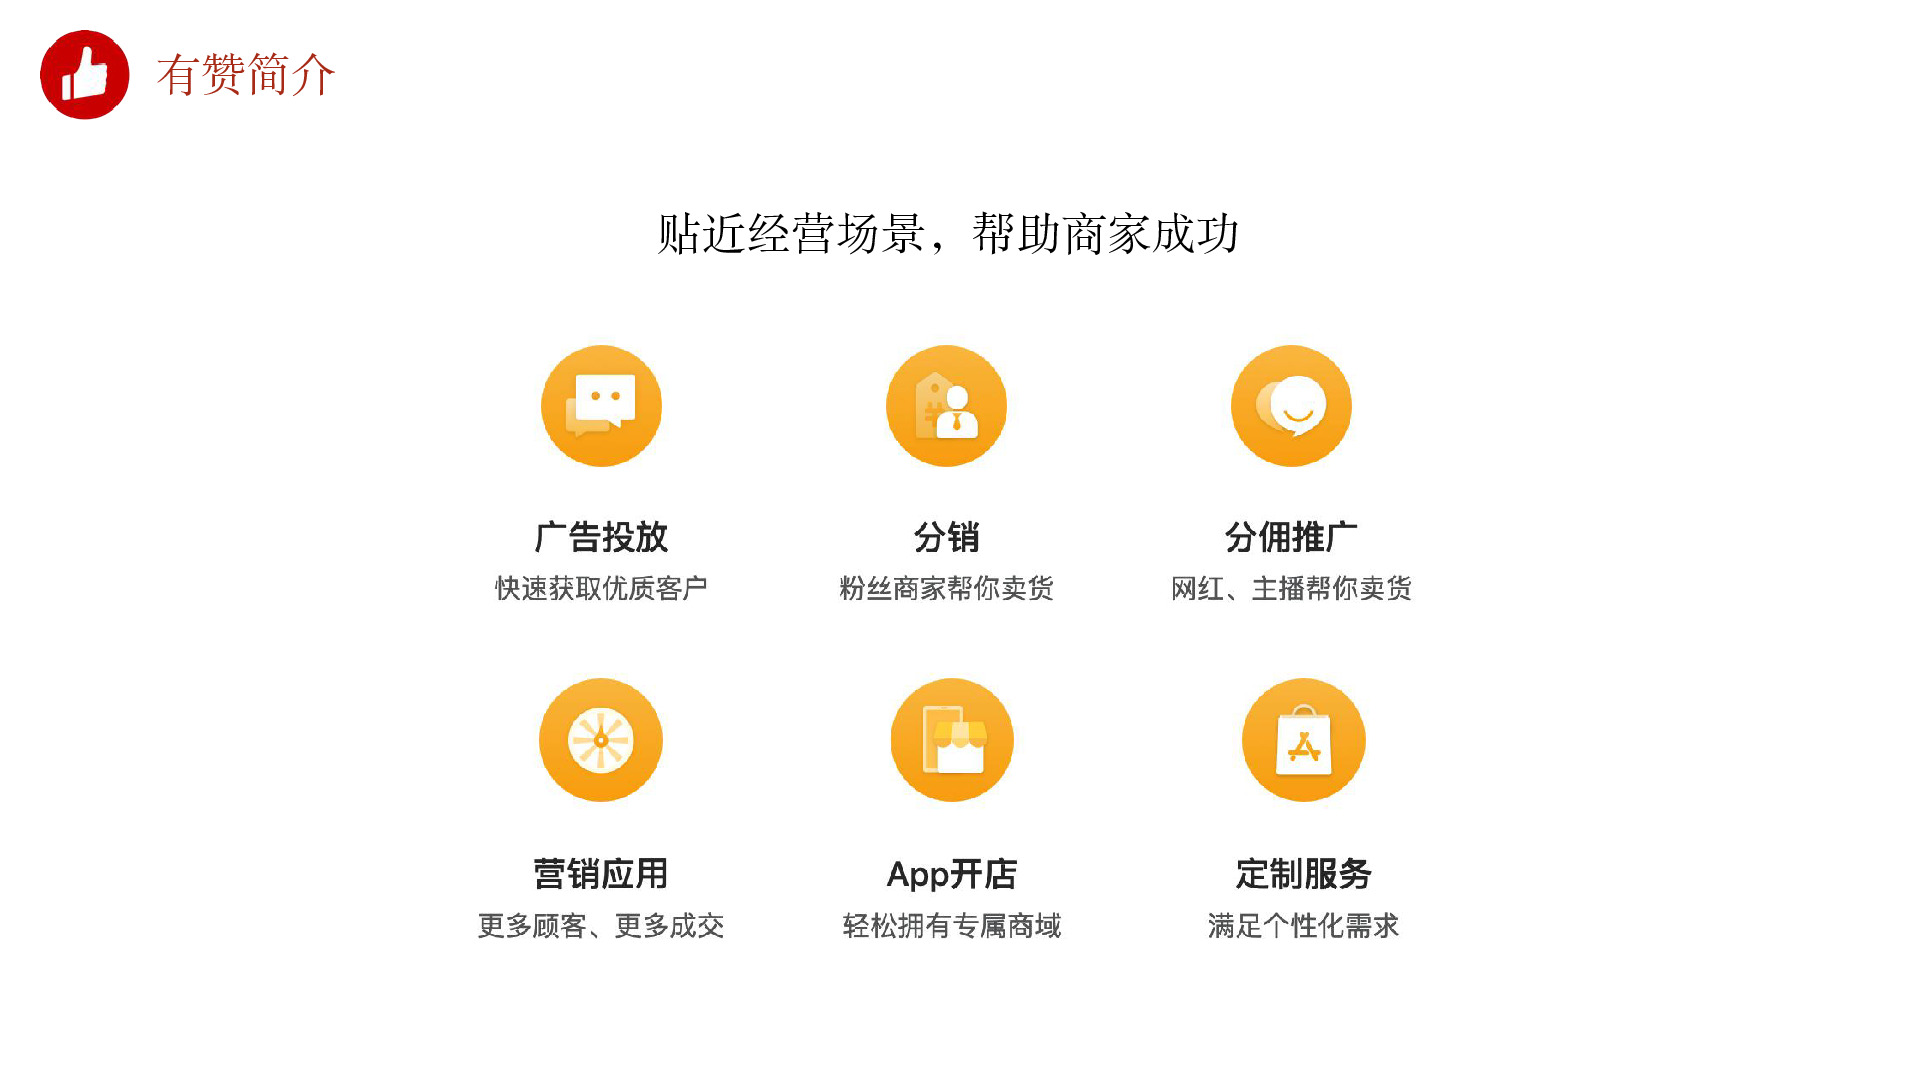 https://opentalk-blog.b0.upaiyun.com/prod/2020-12-28/022b3d3e03324e4307217e538238a275